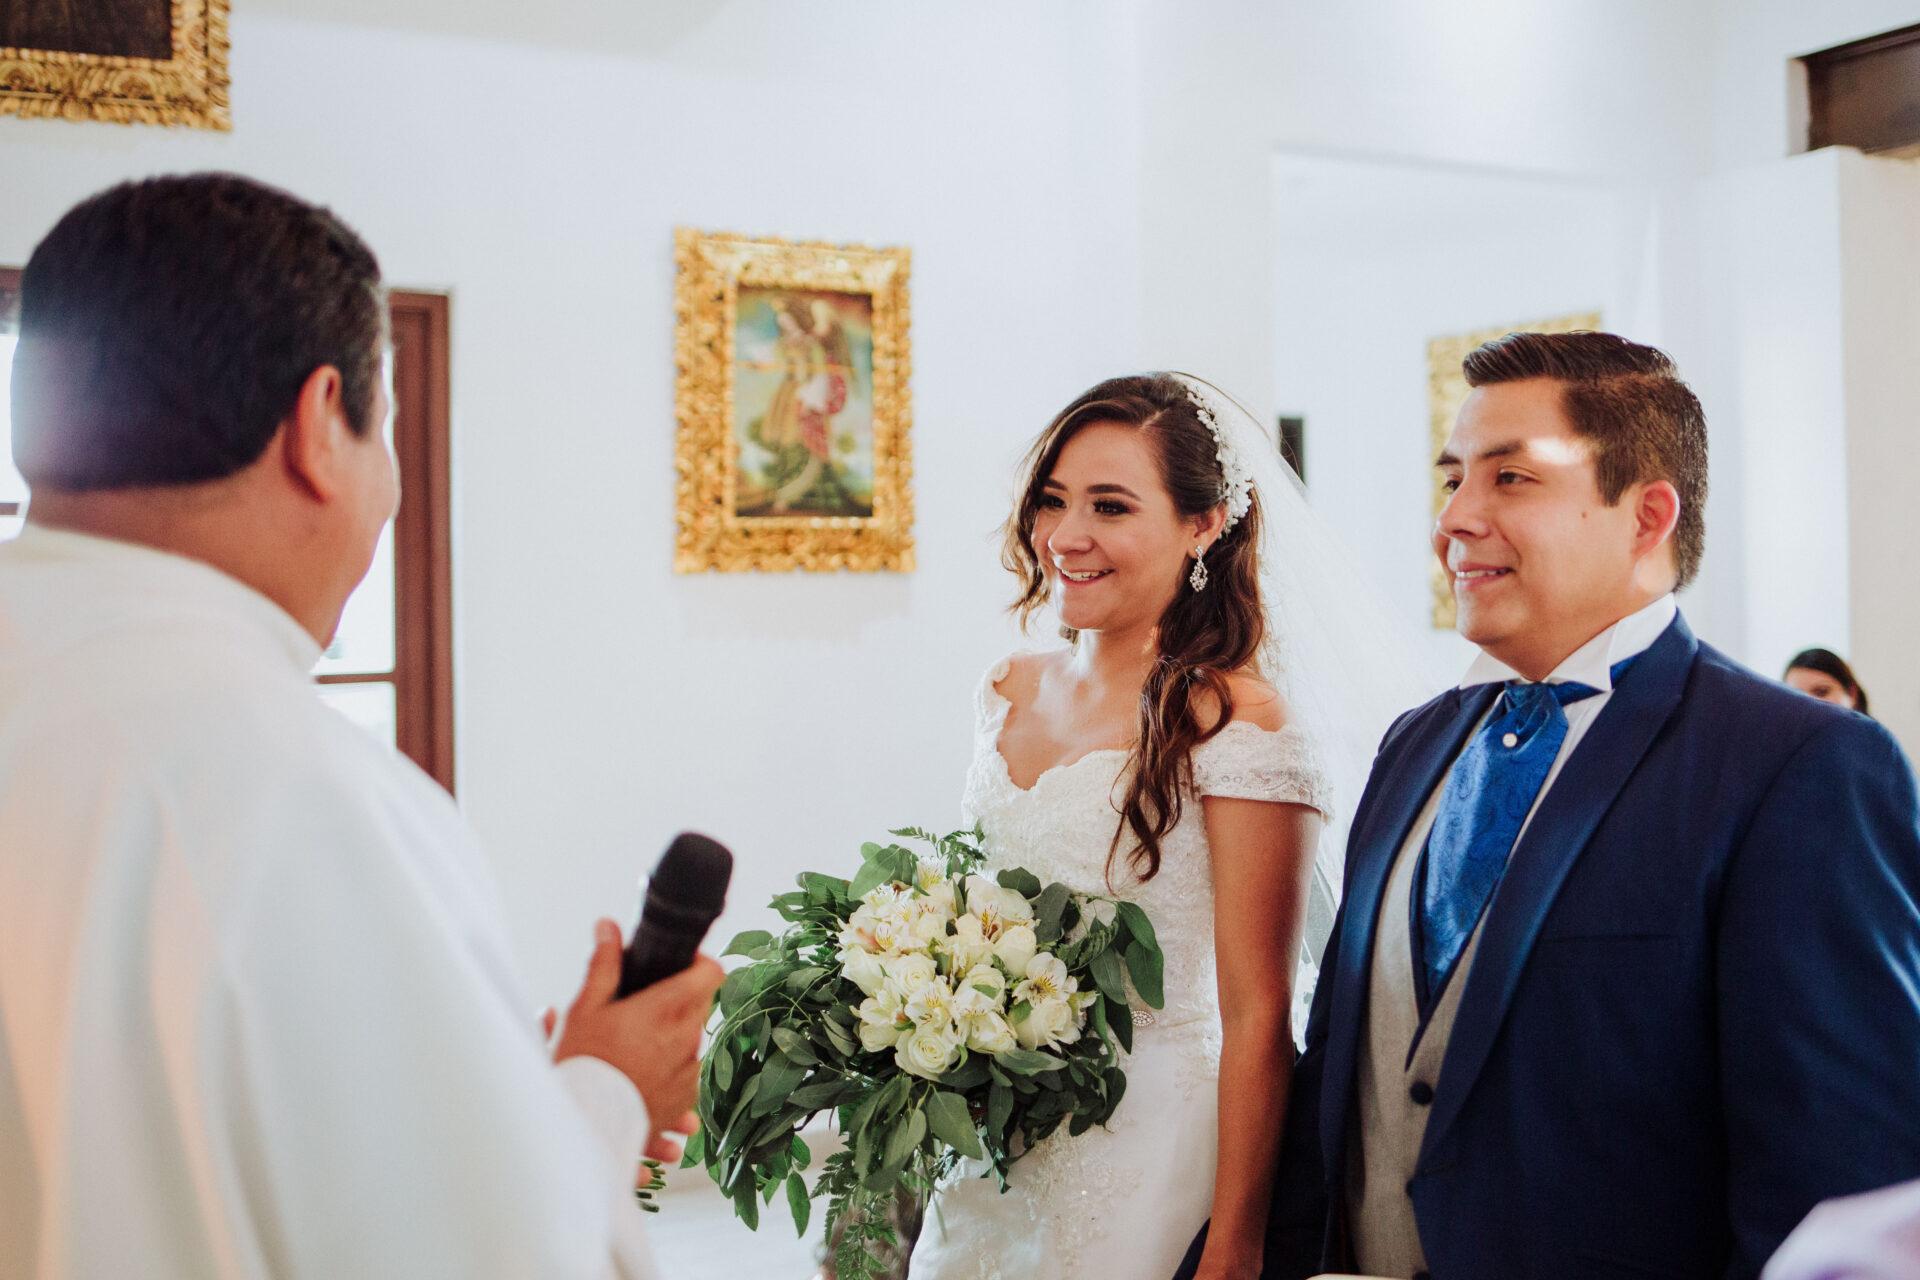 javier_noriega_fotografo_bodas_torreon_coahuila_zacatecas_wedding_photographer29a